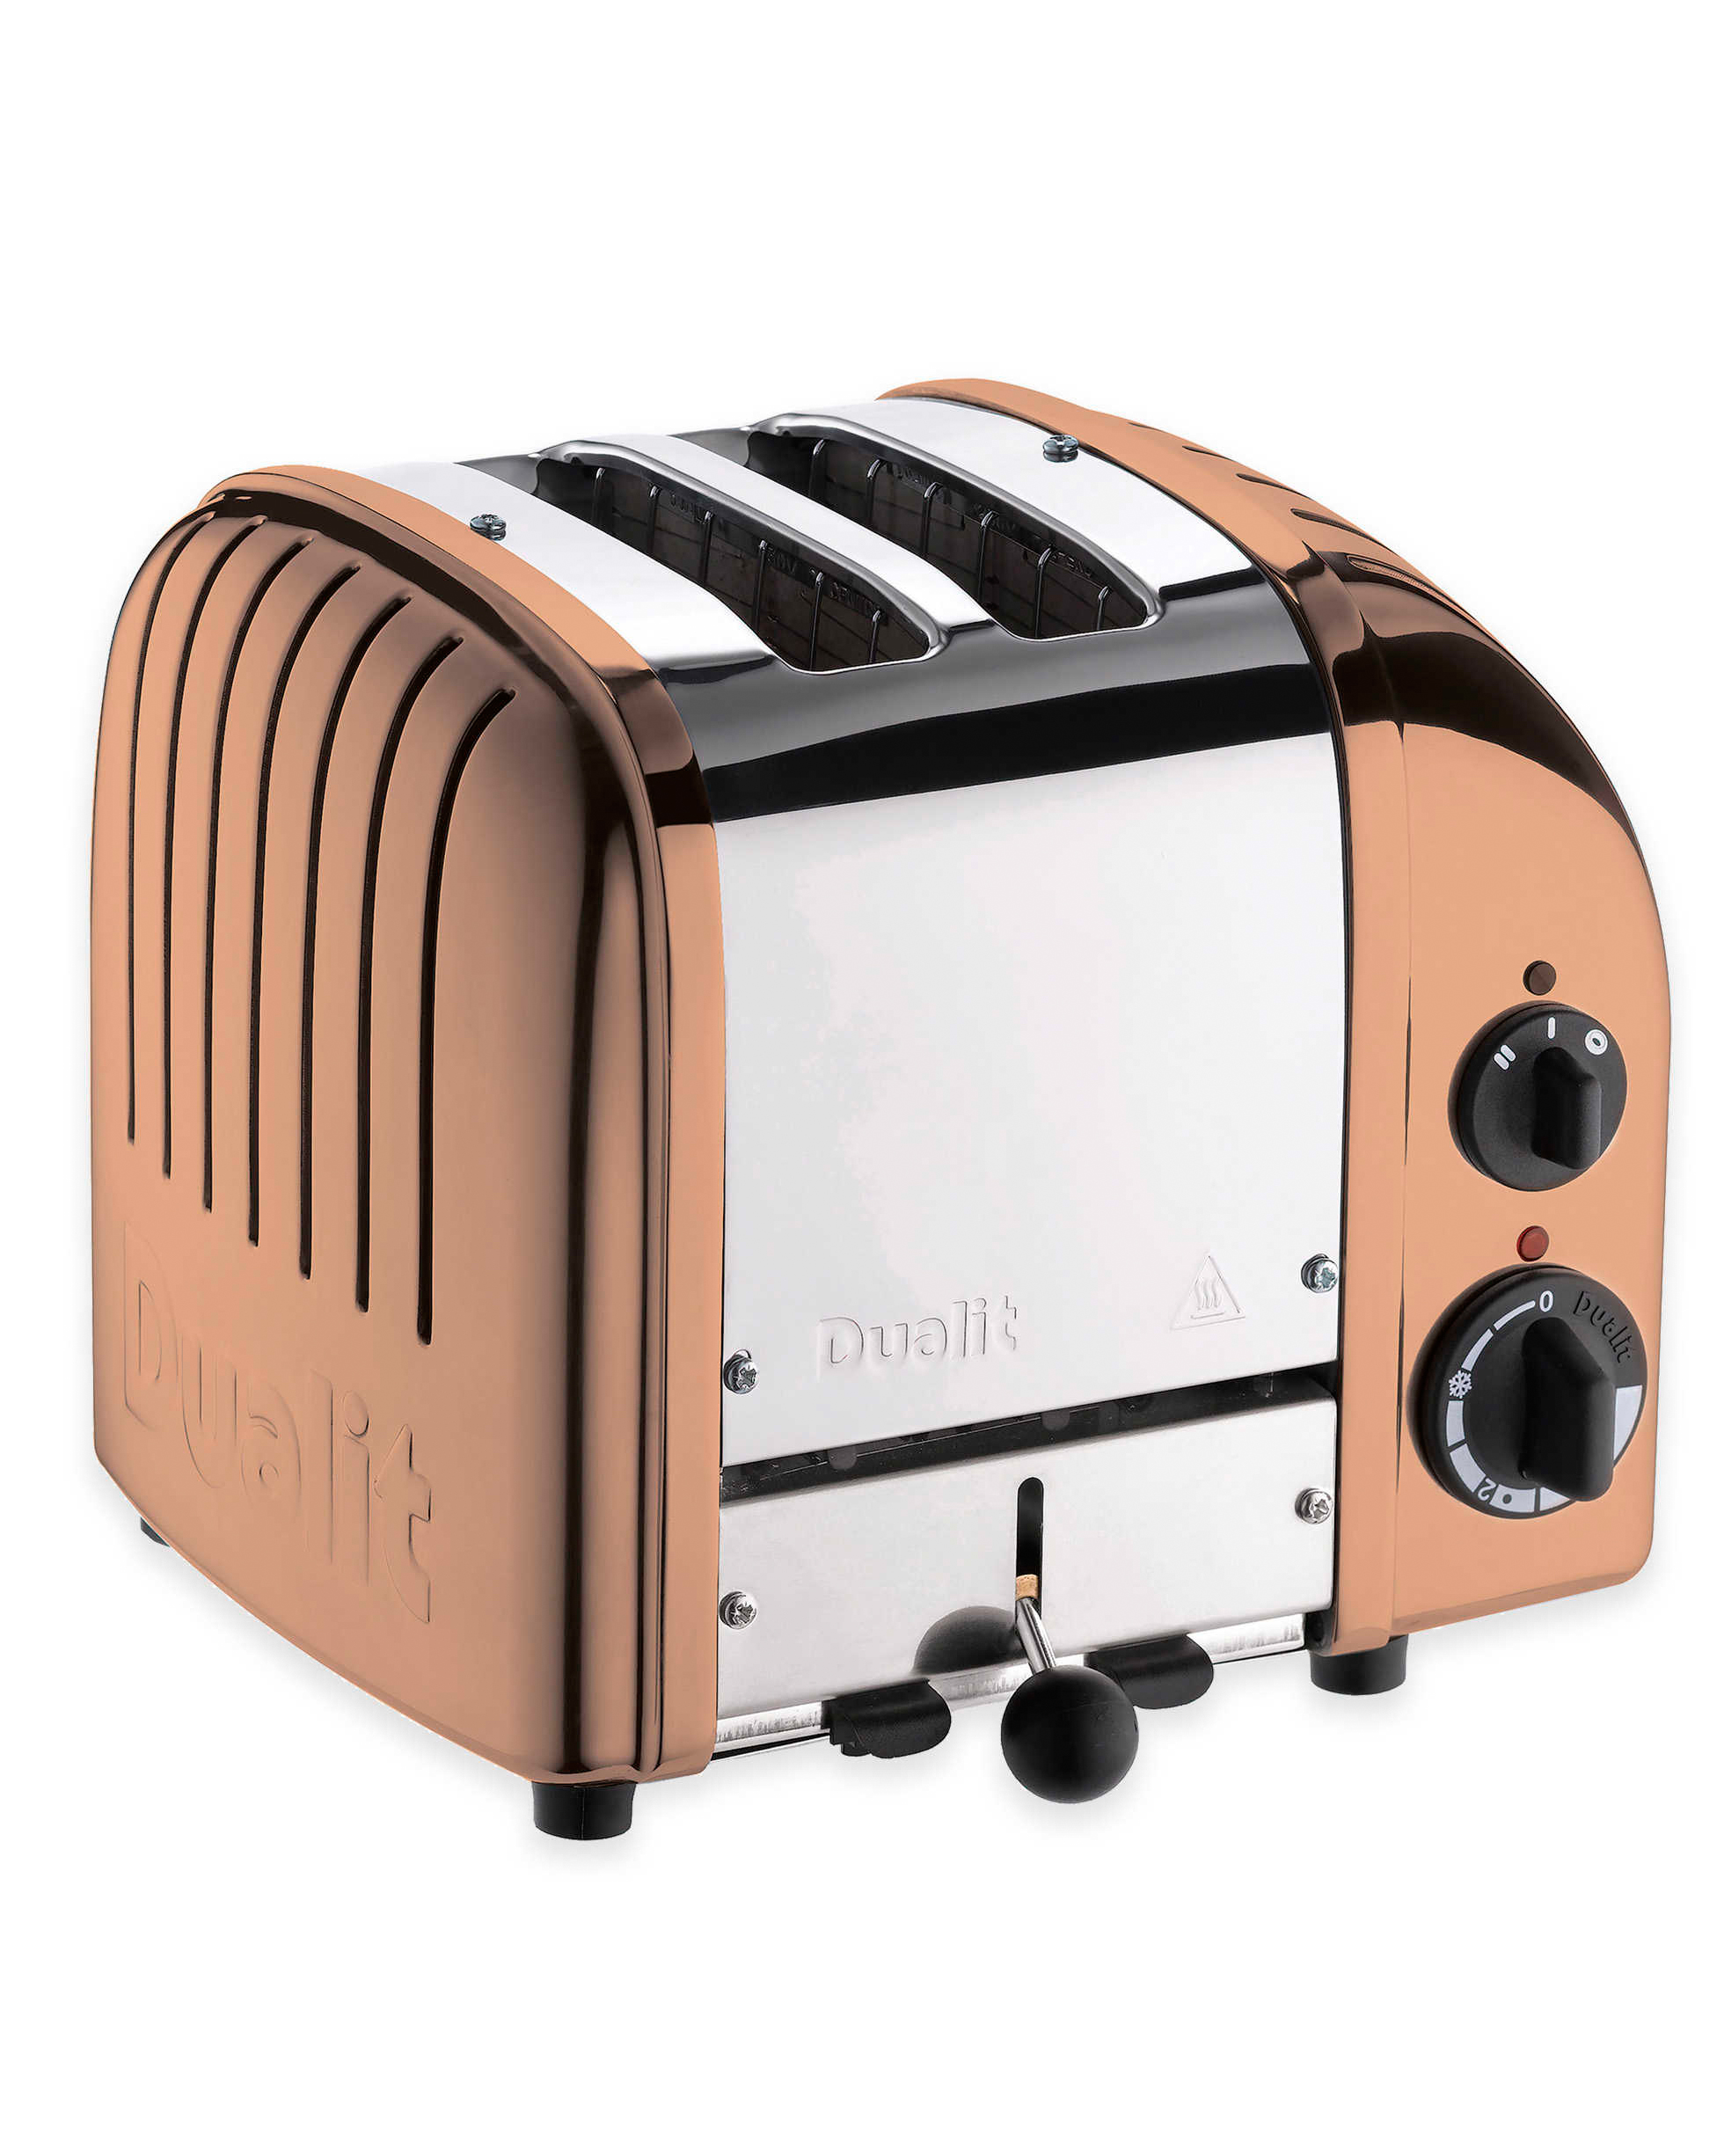 copper-registry-dualit-new-gen-toaster-0116.jpg